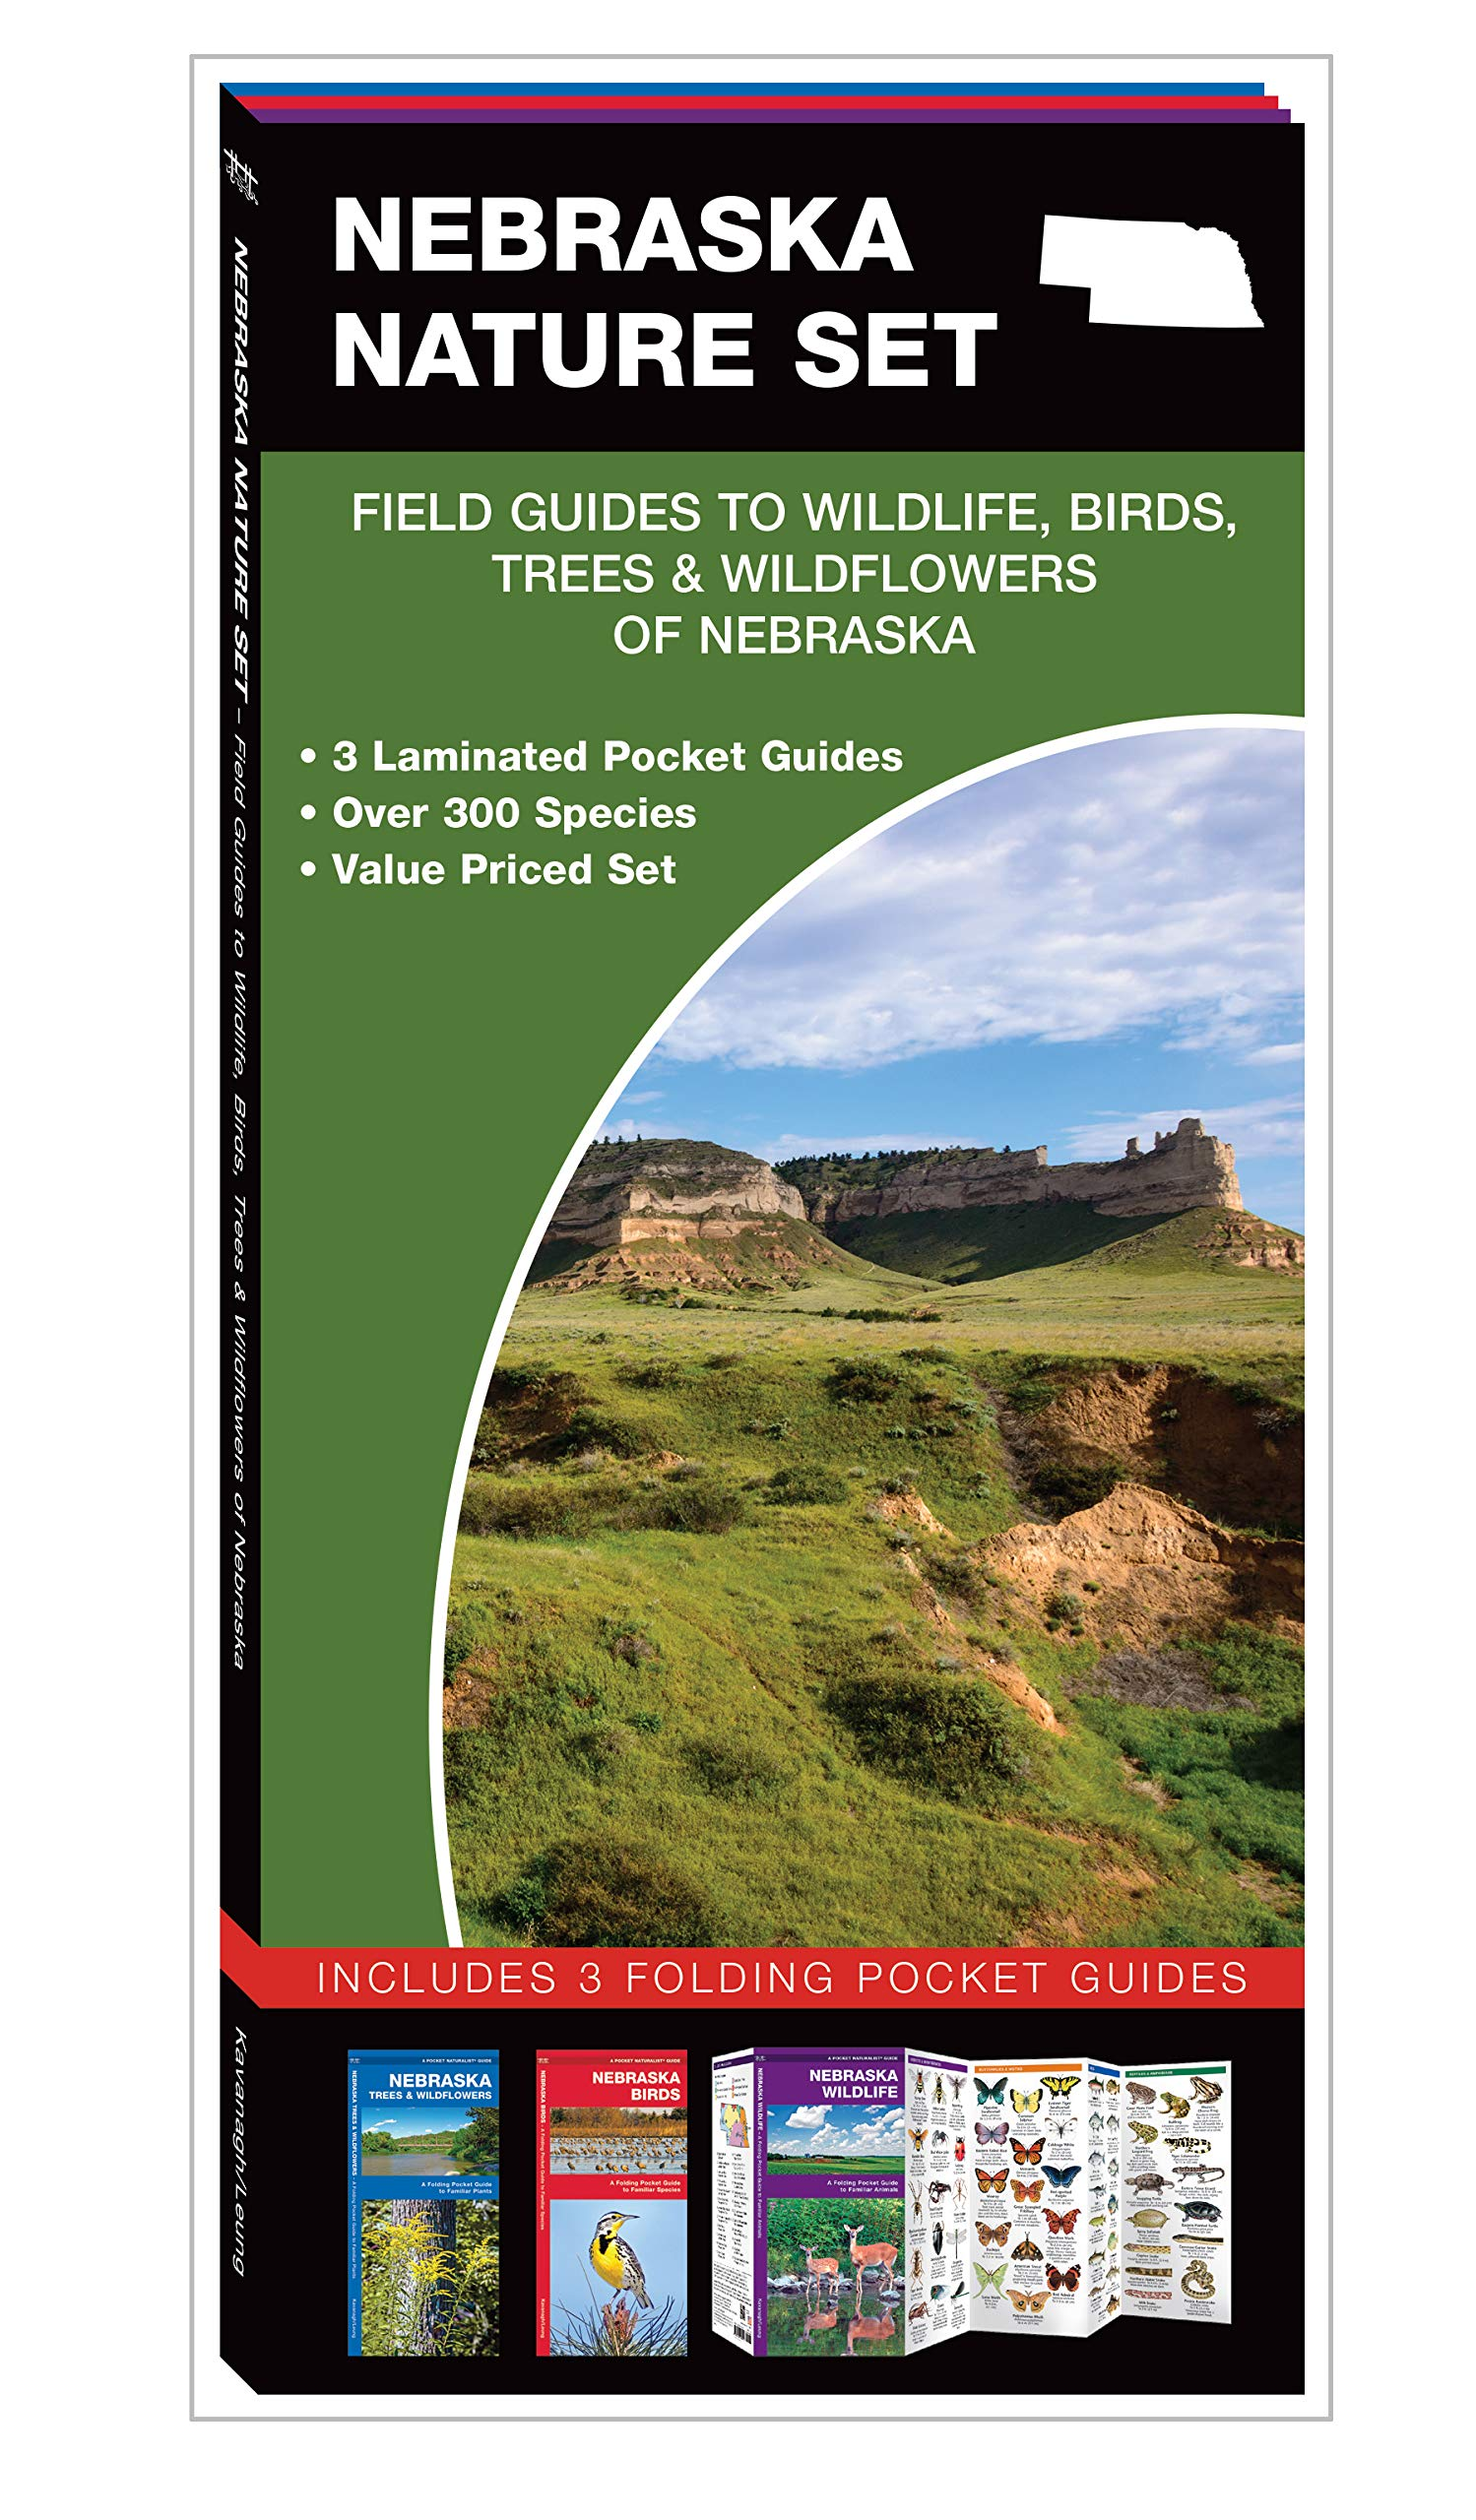 Download Nebraska Nature Set: Field Guides to Wildlife, Birds, Trees & Wildflowers of Nebraska pdf